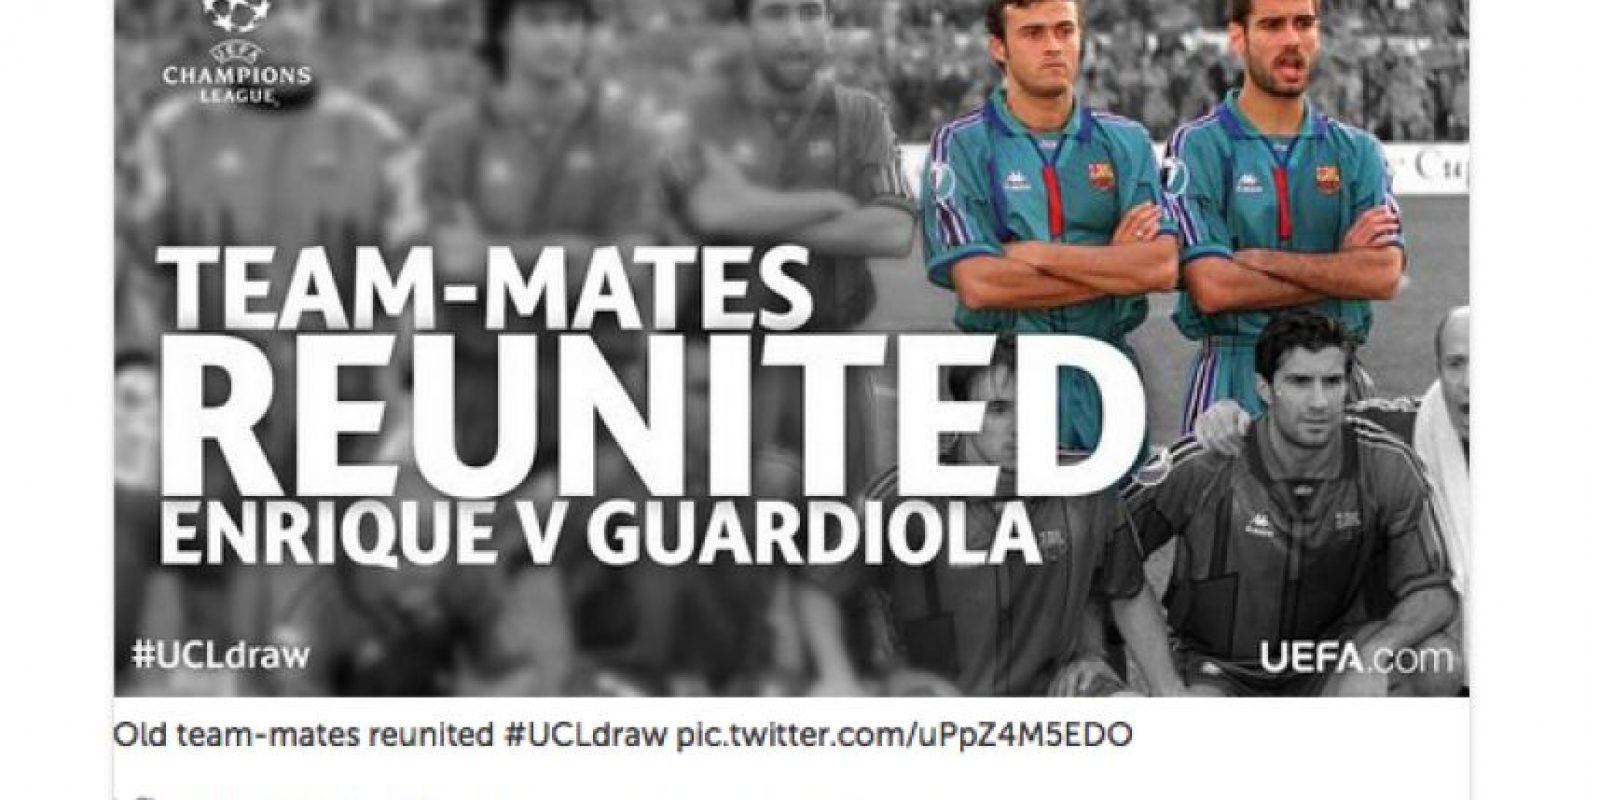 """Compañeros de equipo de reúnen: Enrique vs Guardiola"", publicó la cuenta de la Champions League. Foto:Vía Twitter.com/ChampionsLeague"